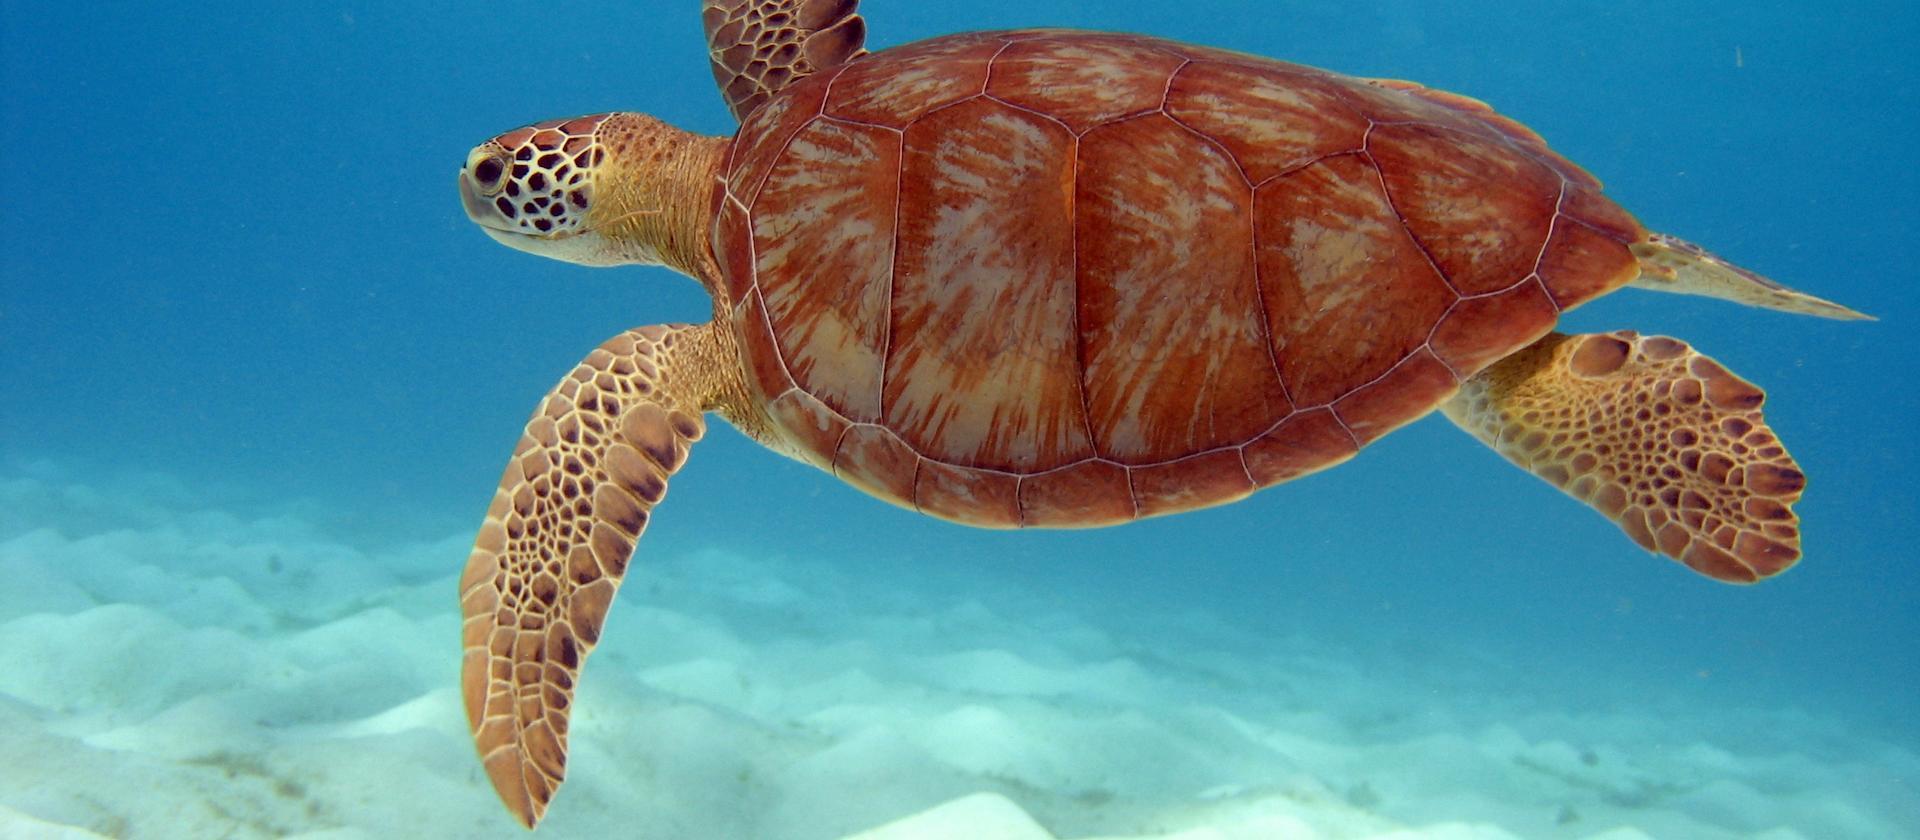 Tortue de mer, Tobagos Cays, Iles Grenadines